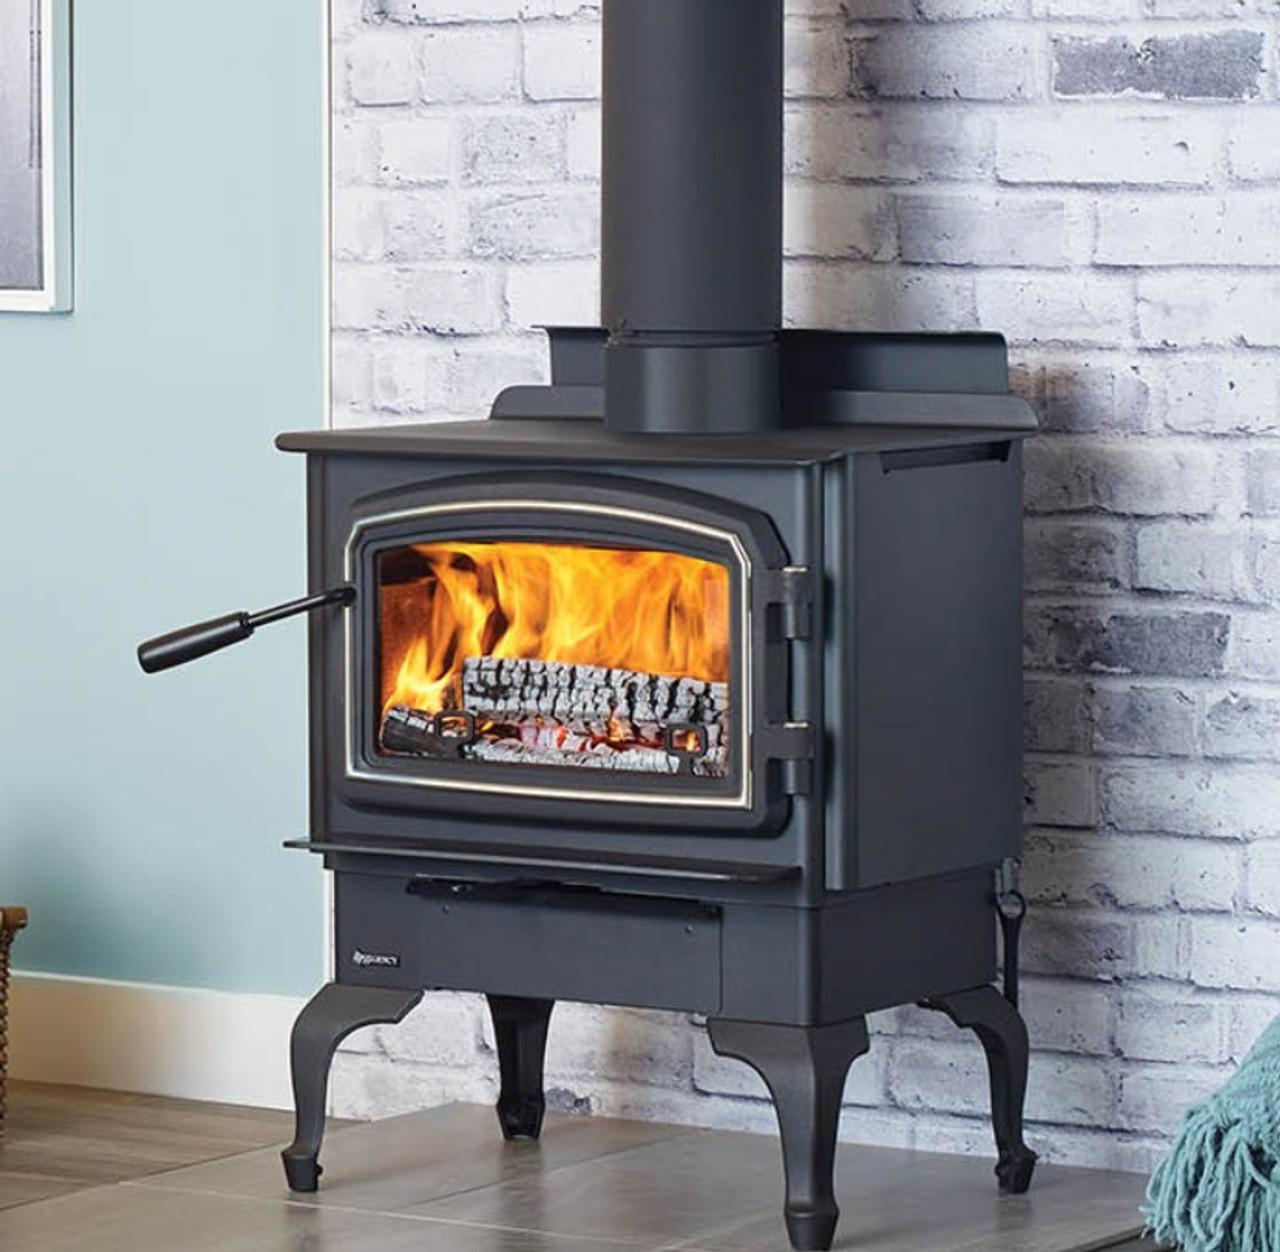 Regency F1150 Wood Stove